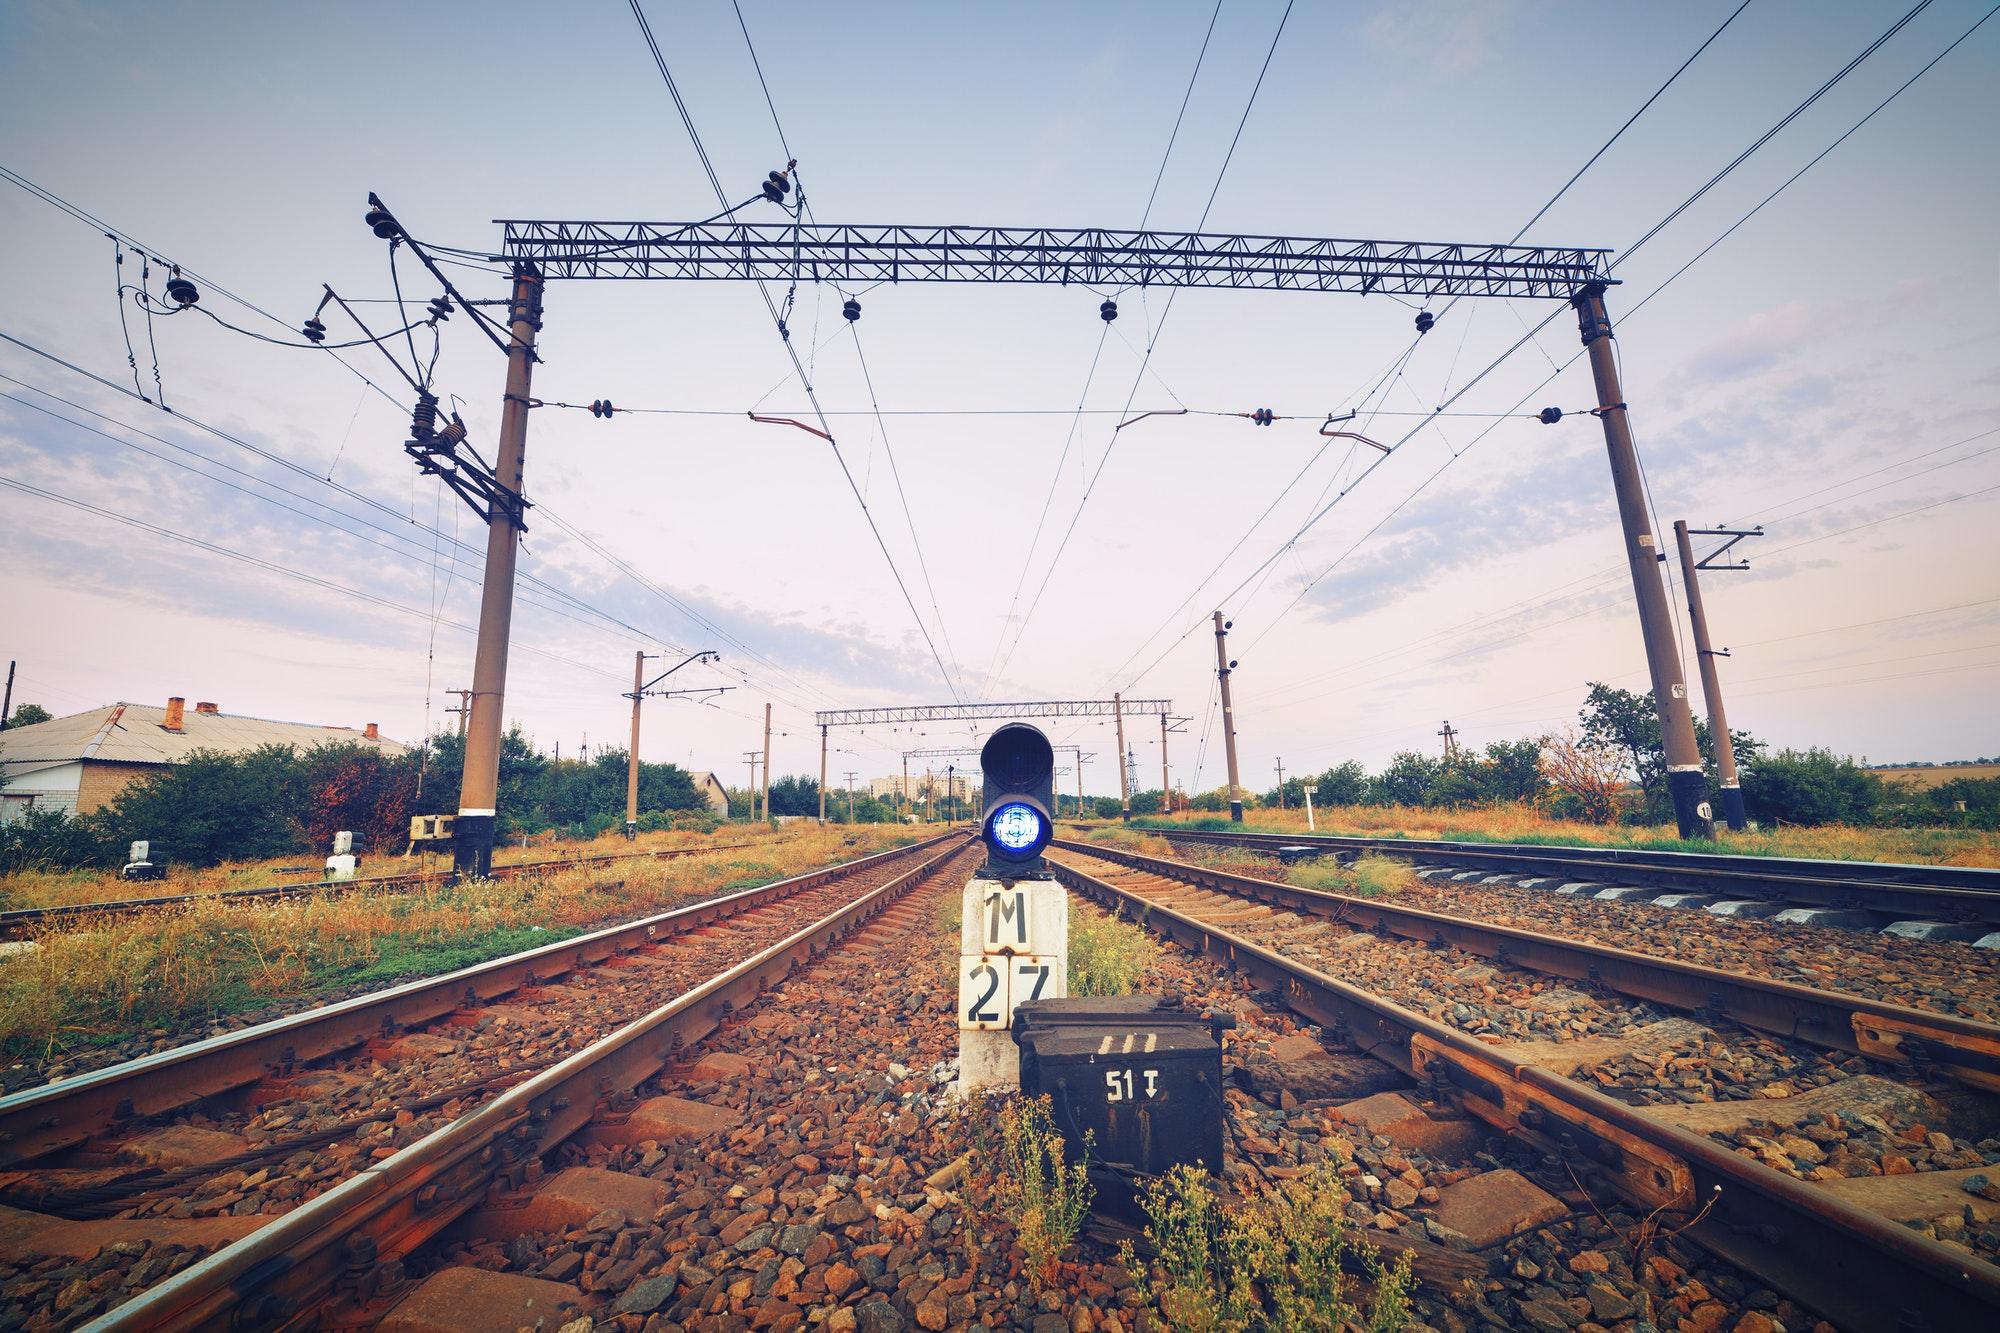 Train platform and traffic light at sunset. Railroad. Railway st